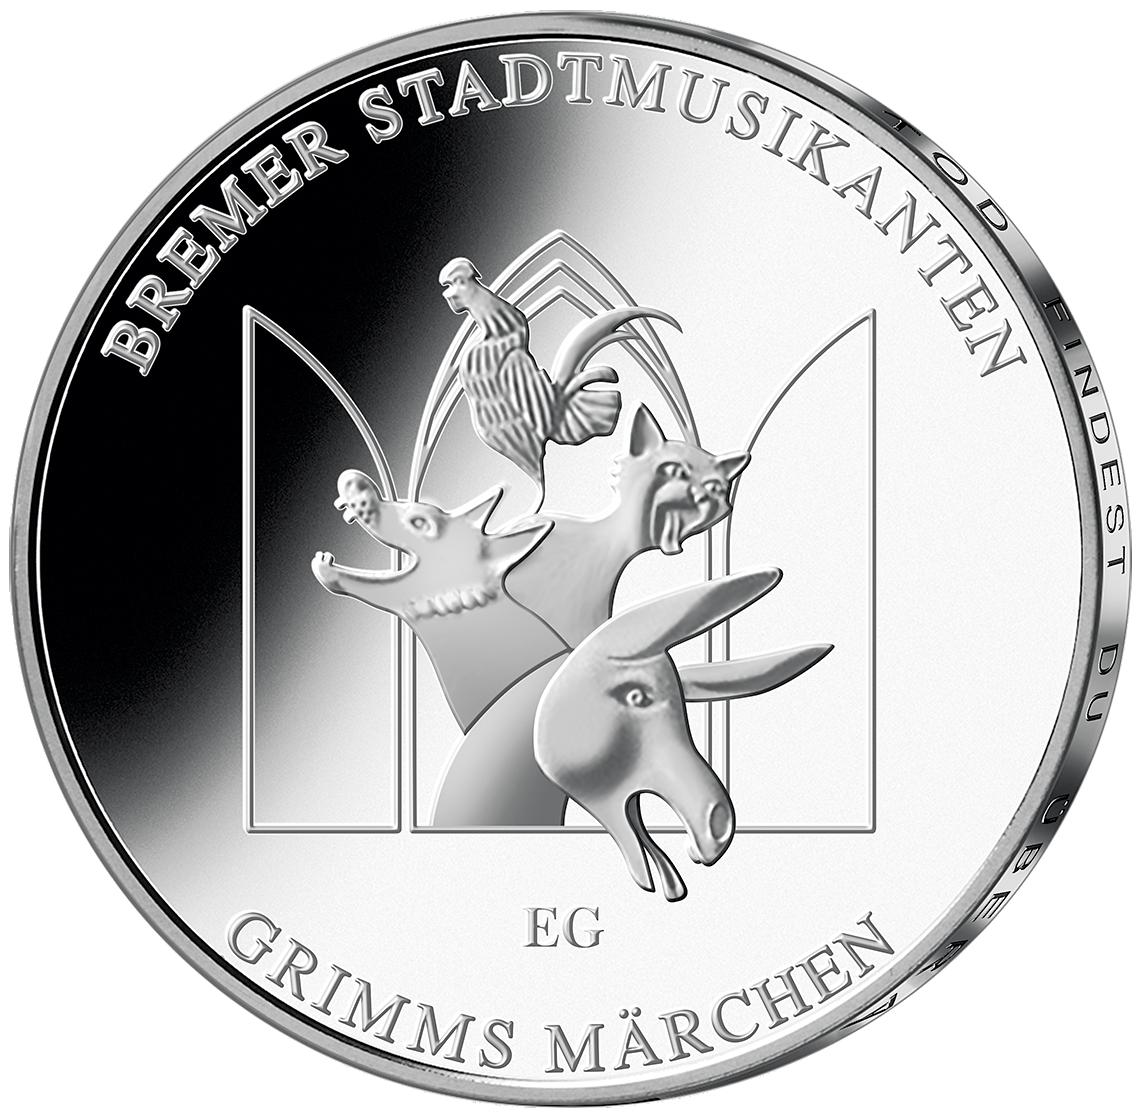 20 Euro Silber Münze Bremer Stadtmusikanten 2017 St Münzen